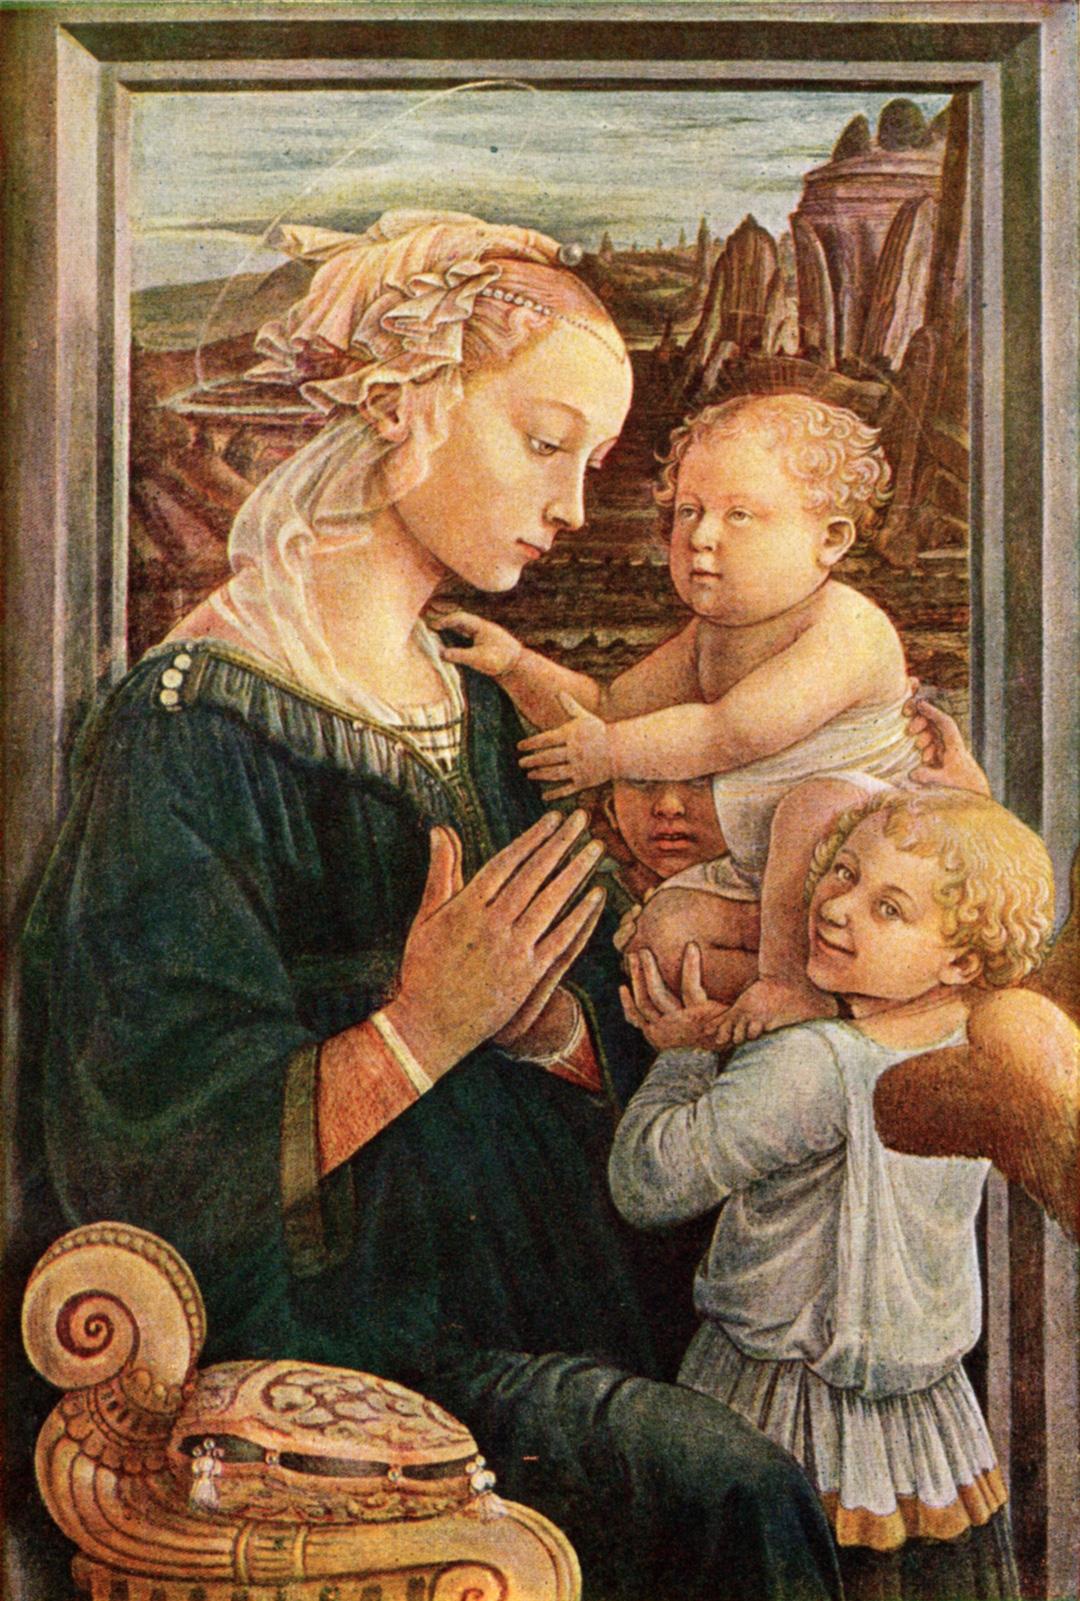 Italian Masterpieces (circa 1900)